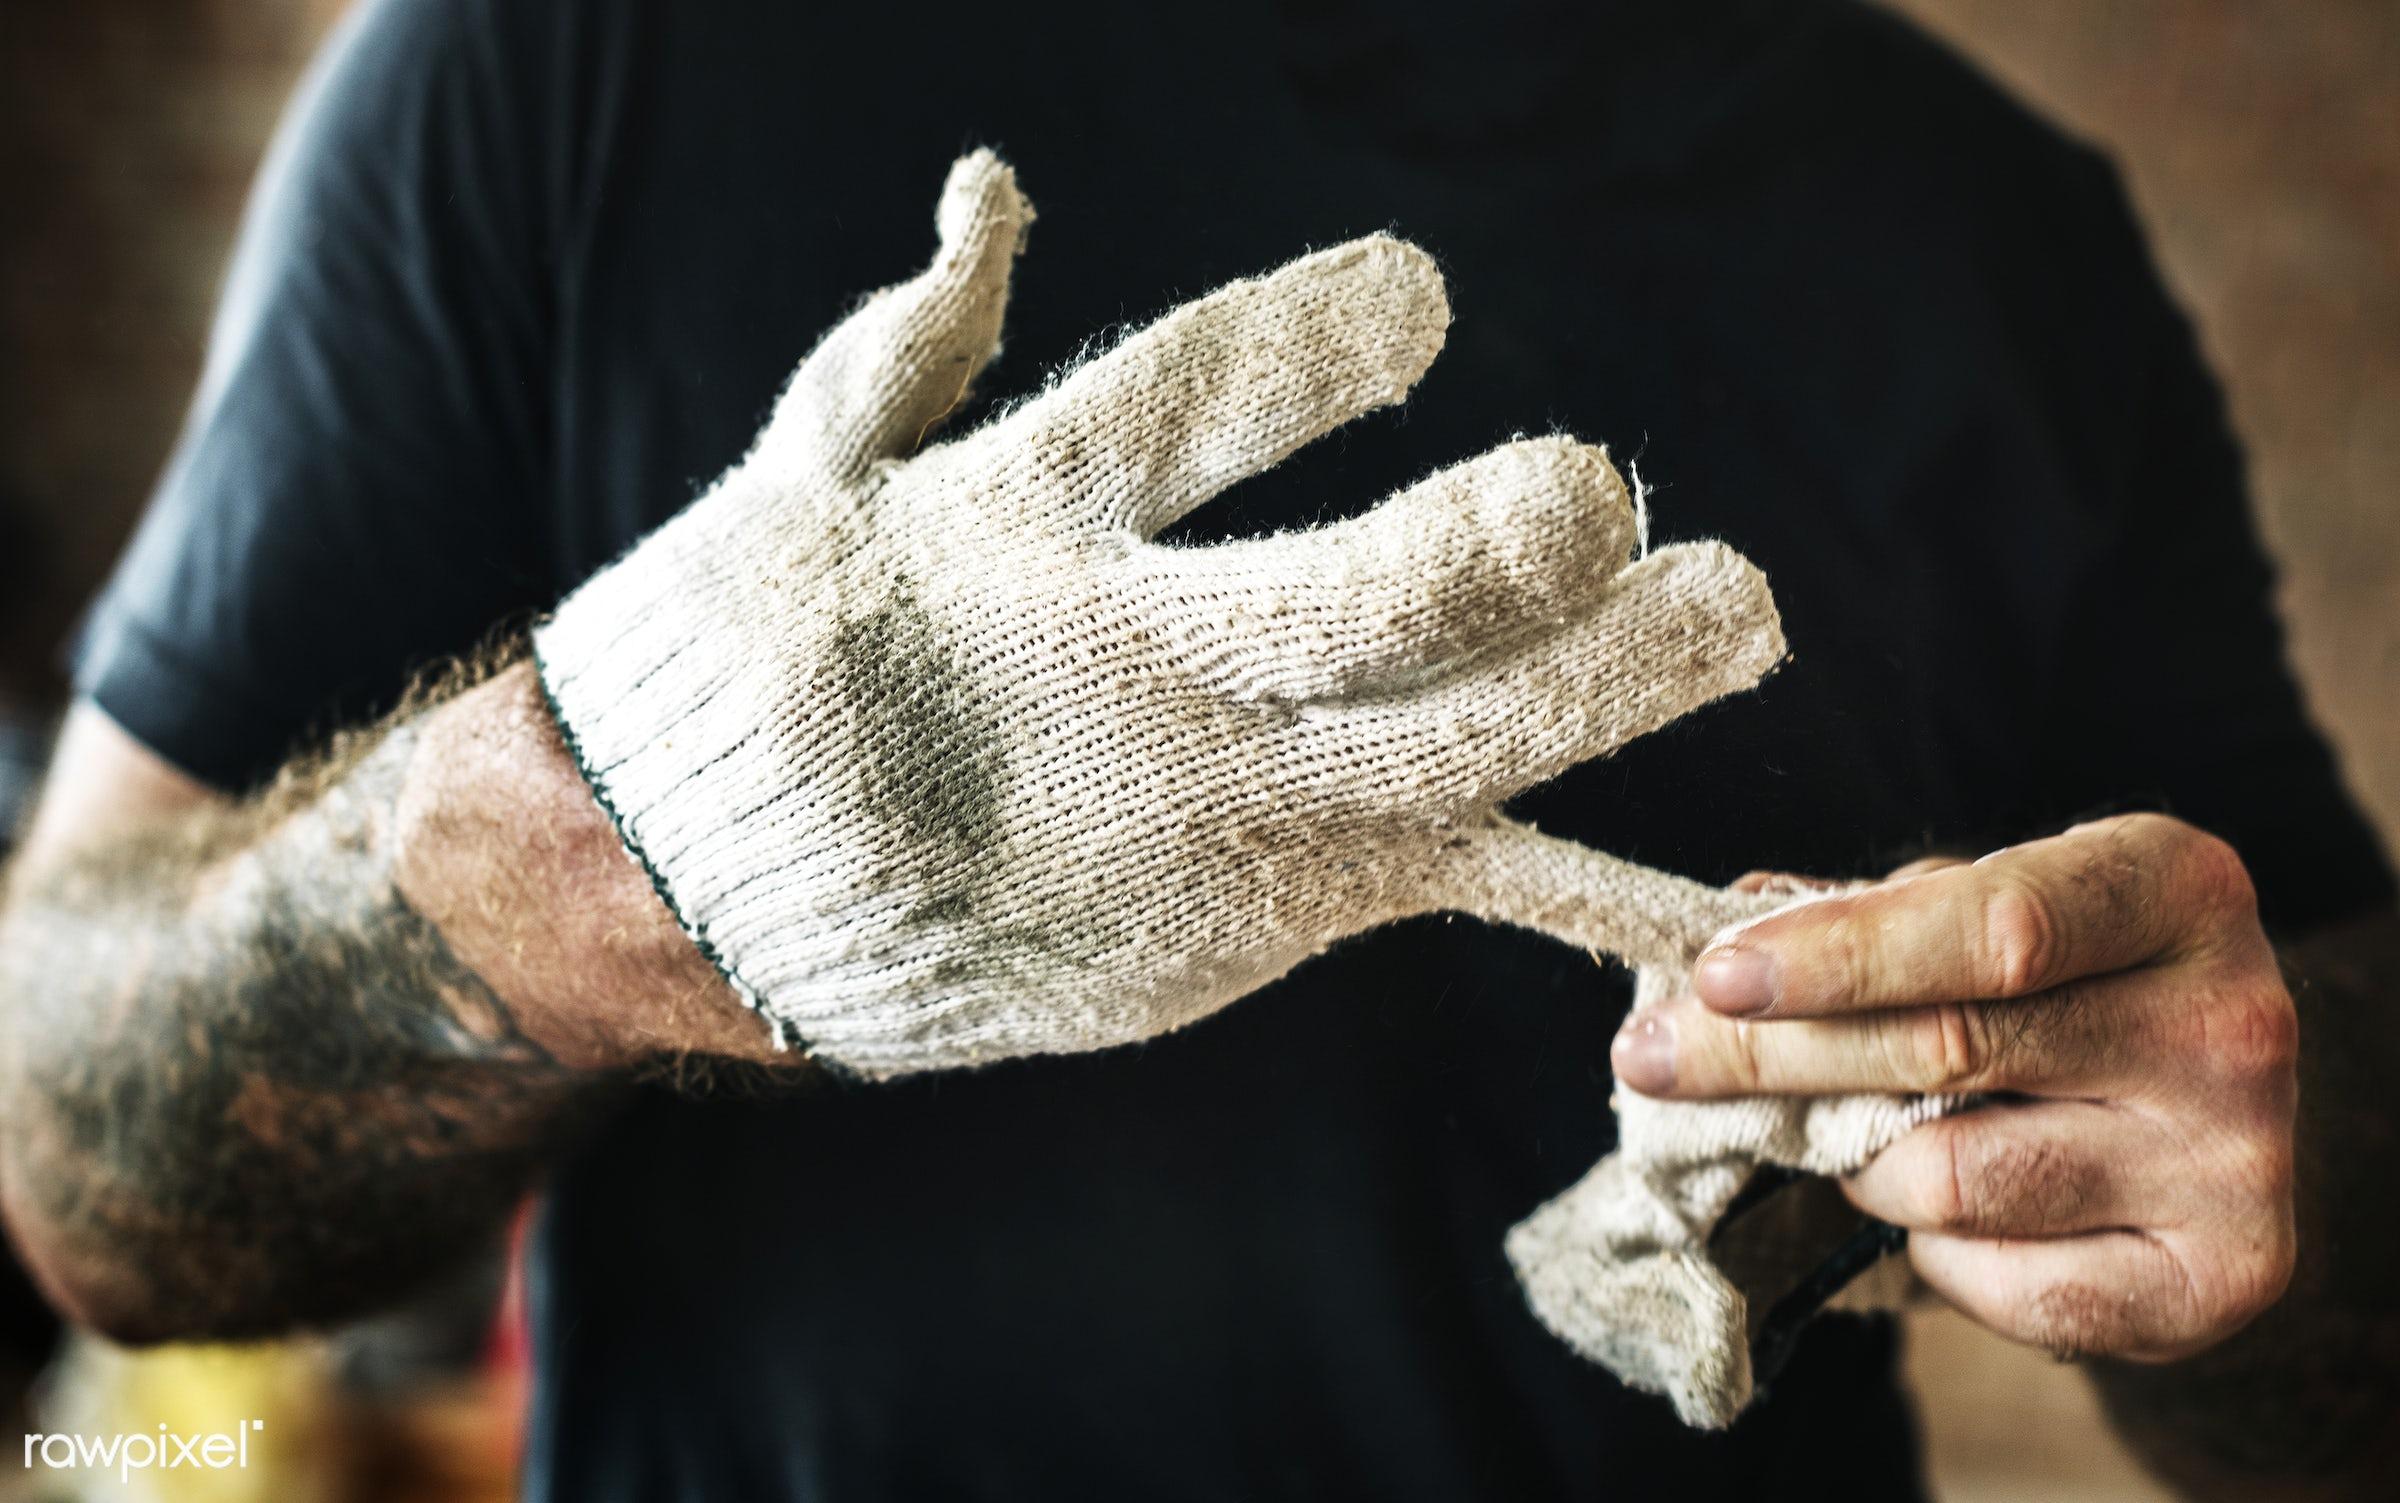 worker, construction, work, build, caution, closeup, craftsman, equipment, glove, gloves, hand, handyman, male, man, manual...